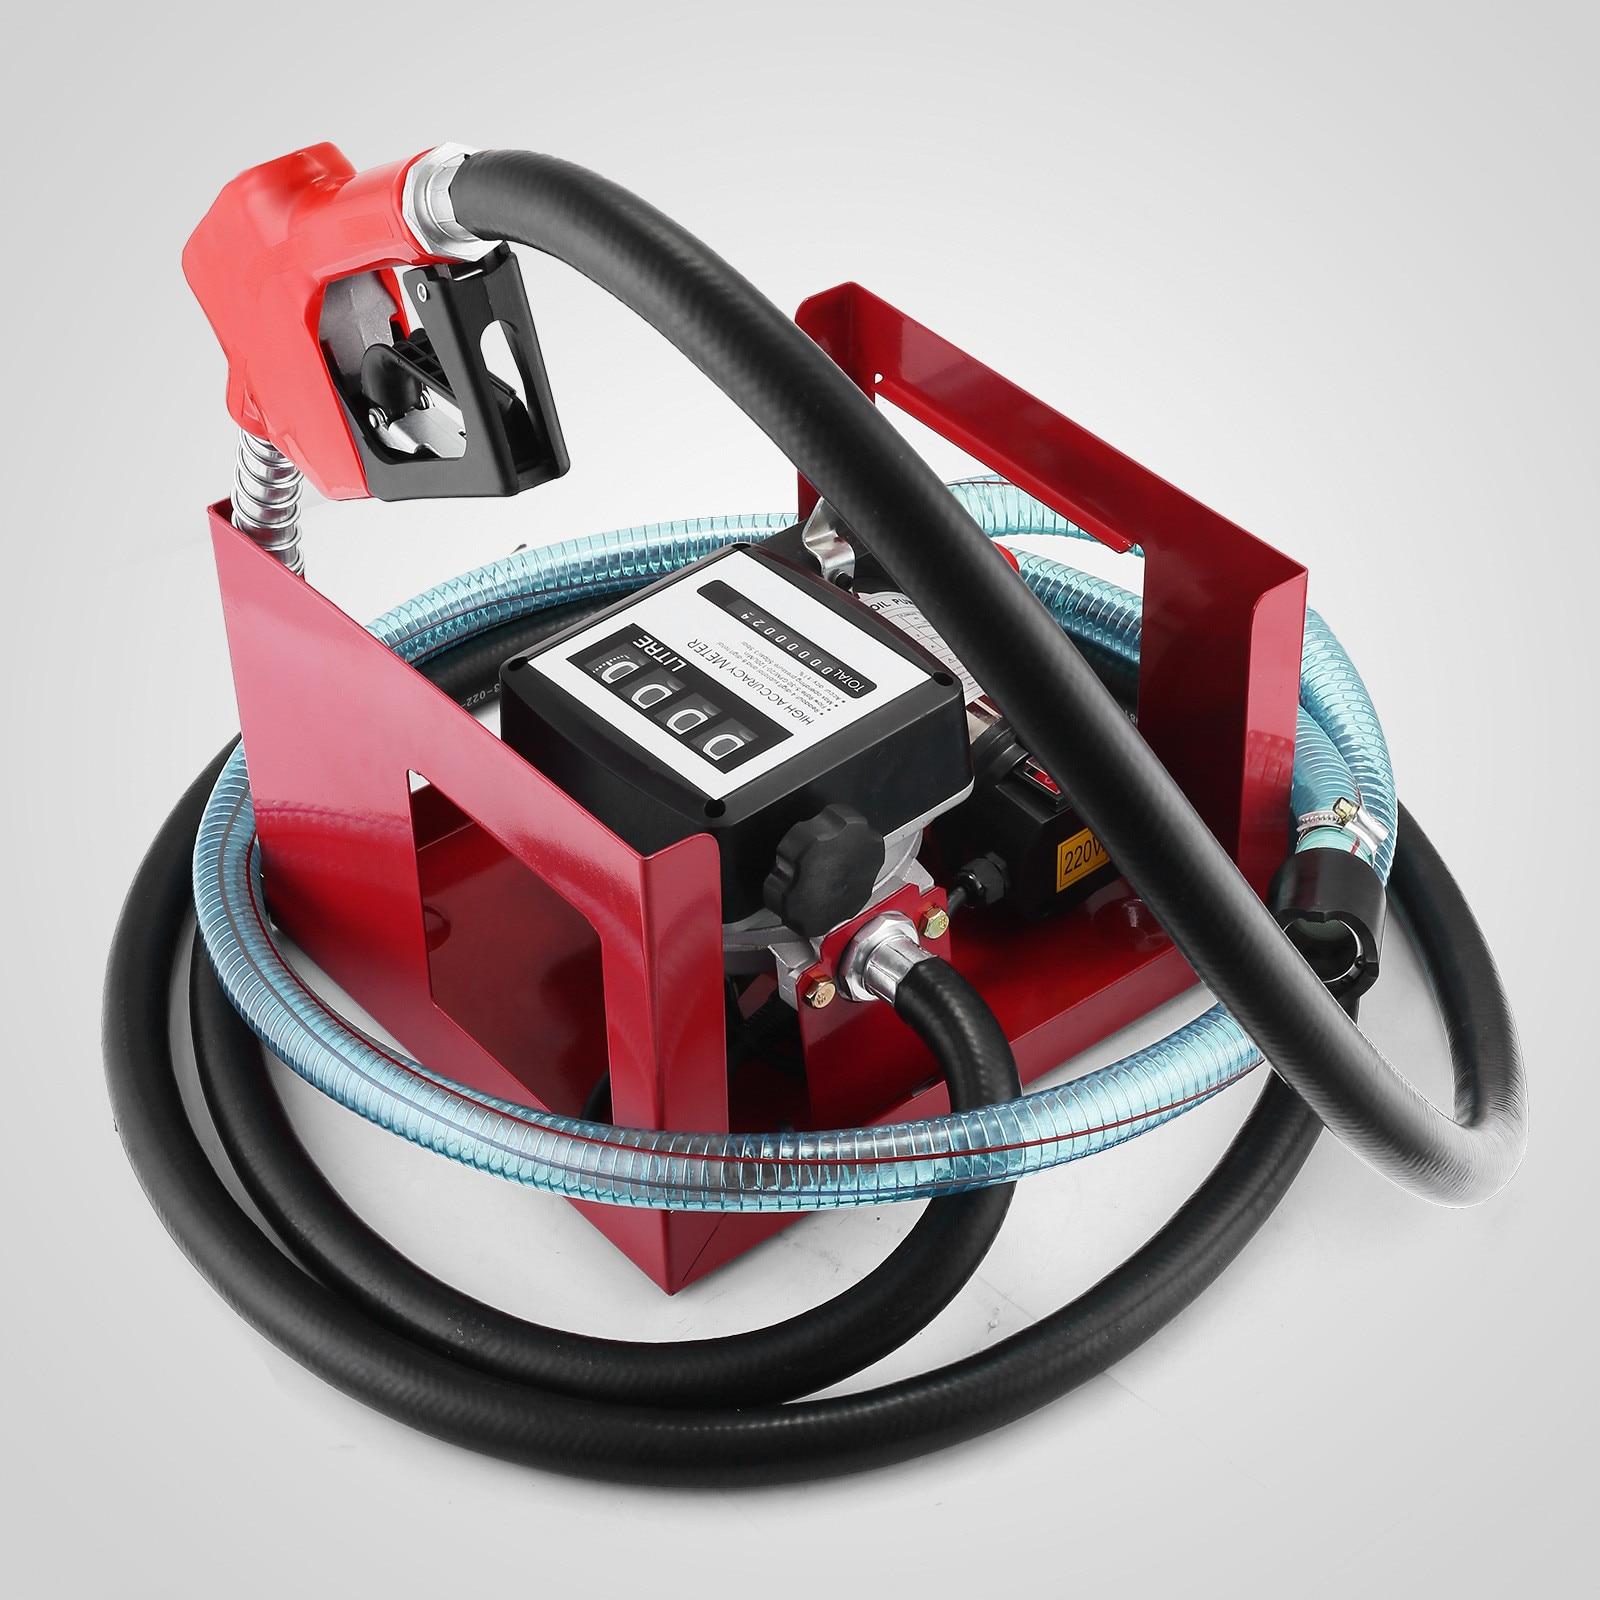 H/d auto priming transferência da bomba de óleo elétrica bio óleo combustível diesel 230v 40l/min novo - 4